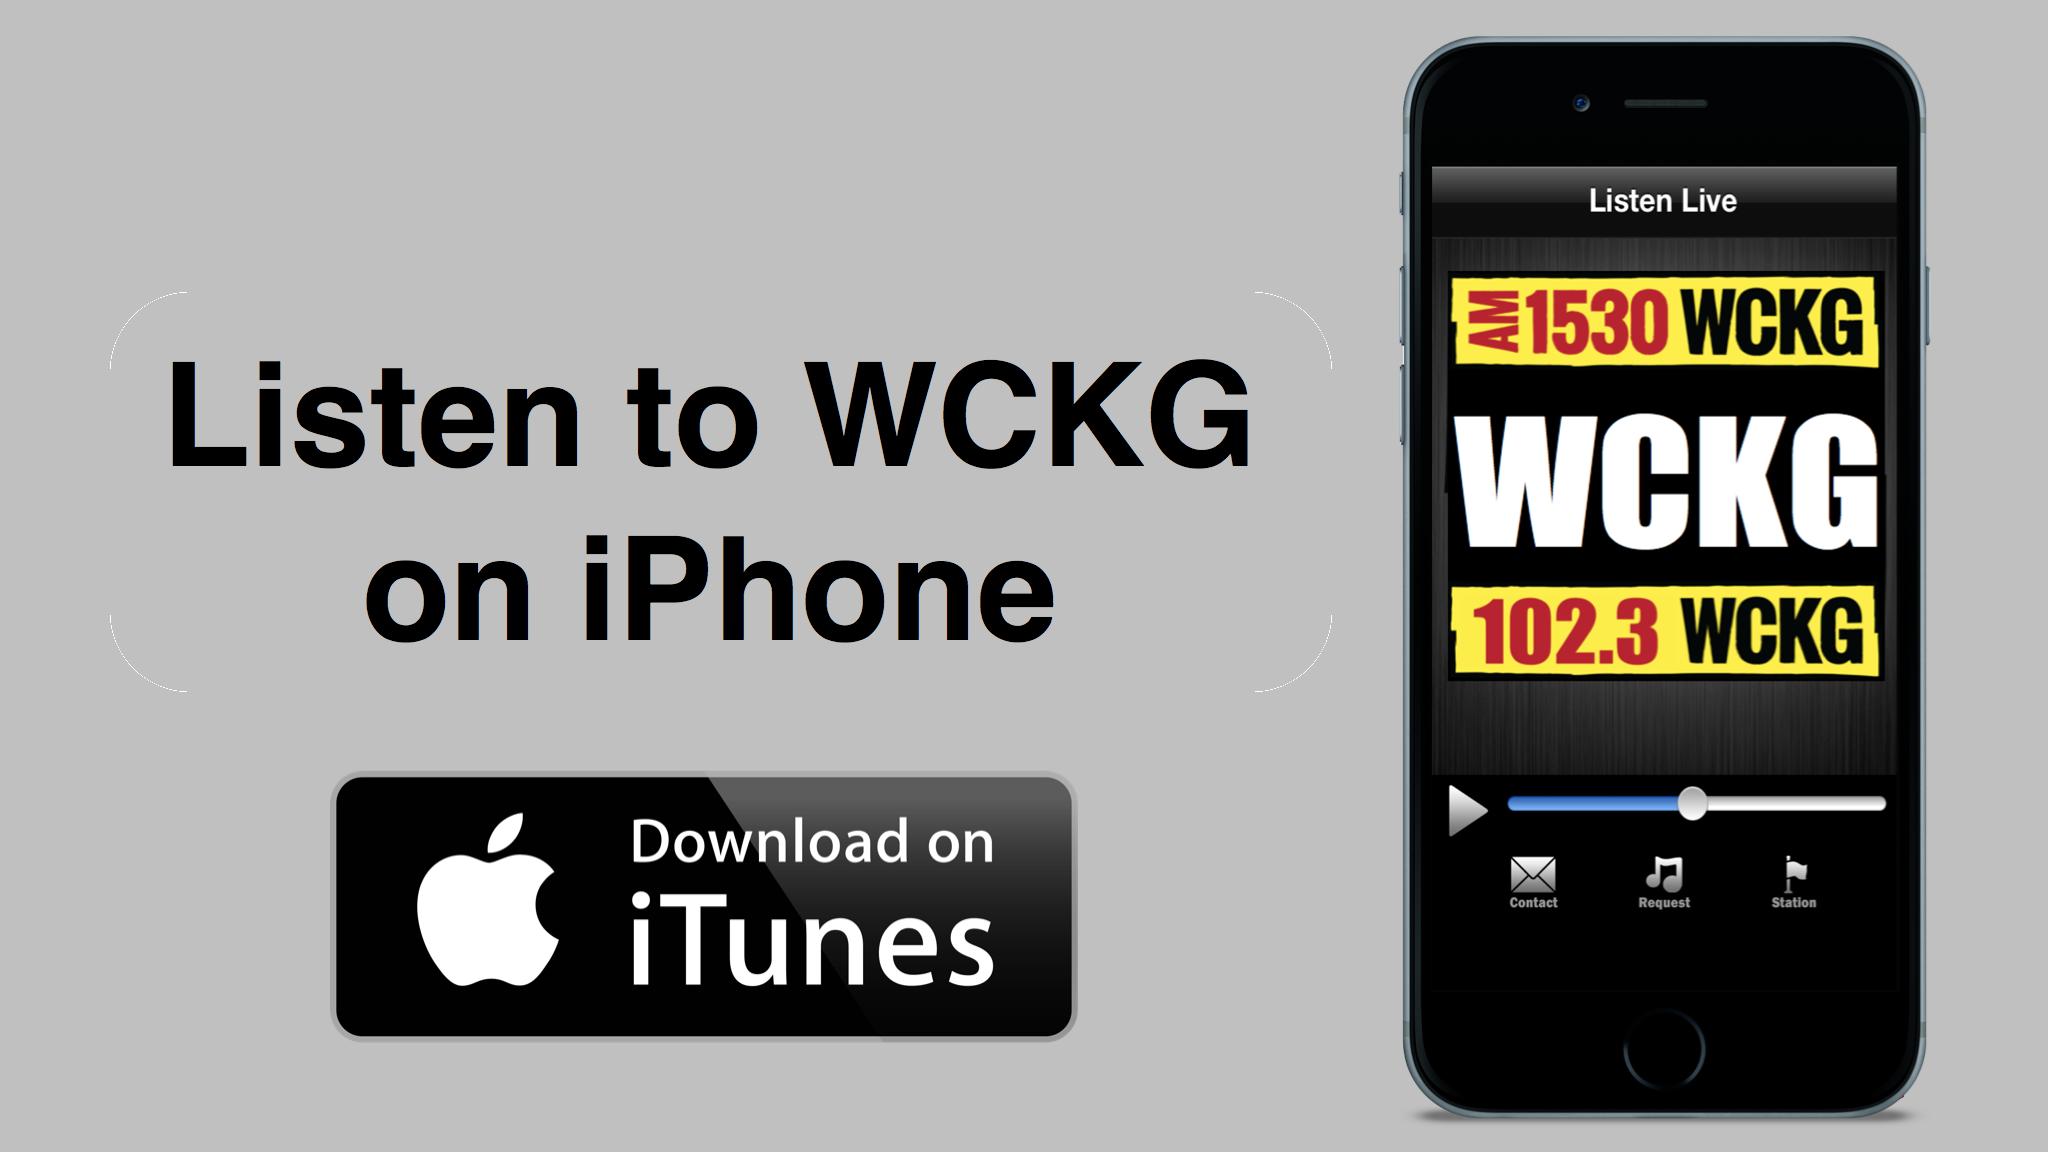 Listen to WCKG in Digital Stereo on Apple iOS